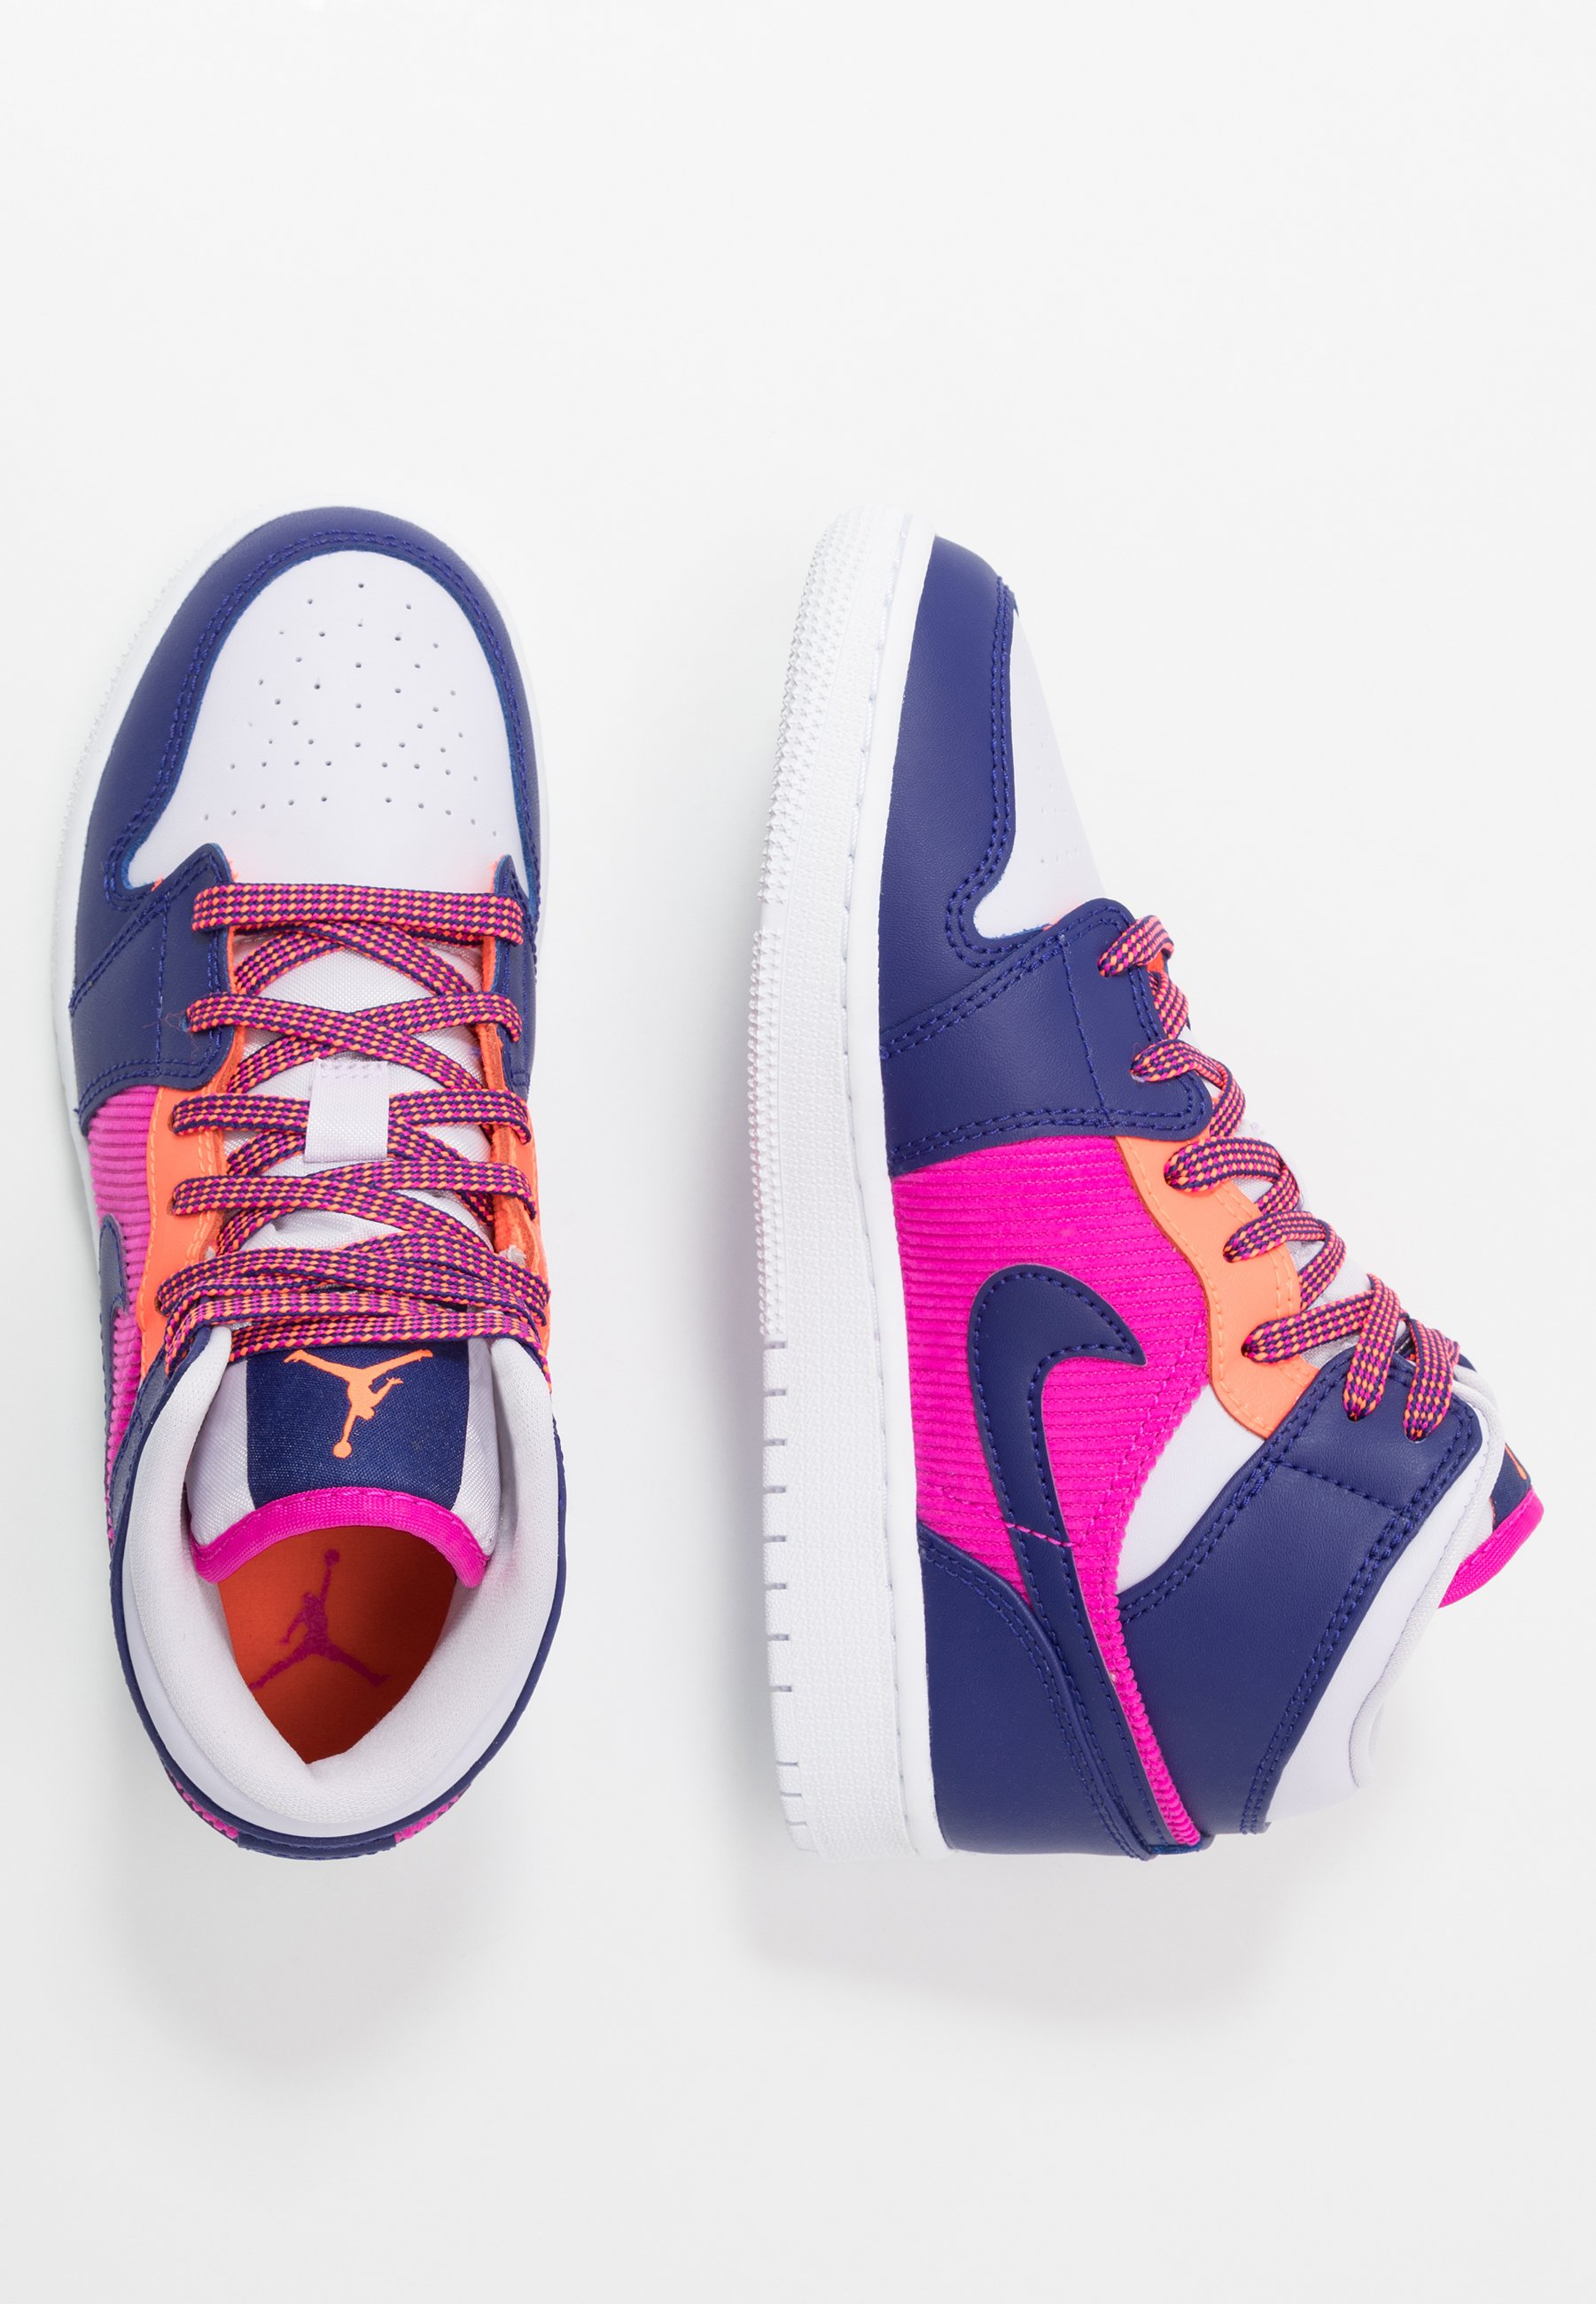 AIR 1 MID Chaussures de basket fire pinkregency purplebarely grape